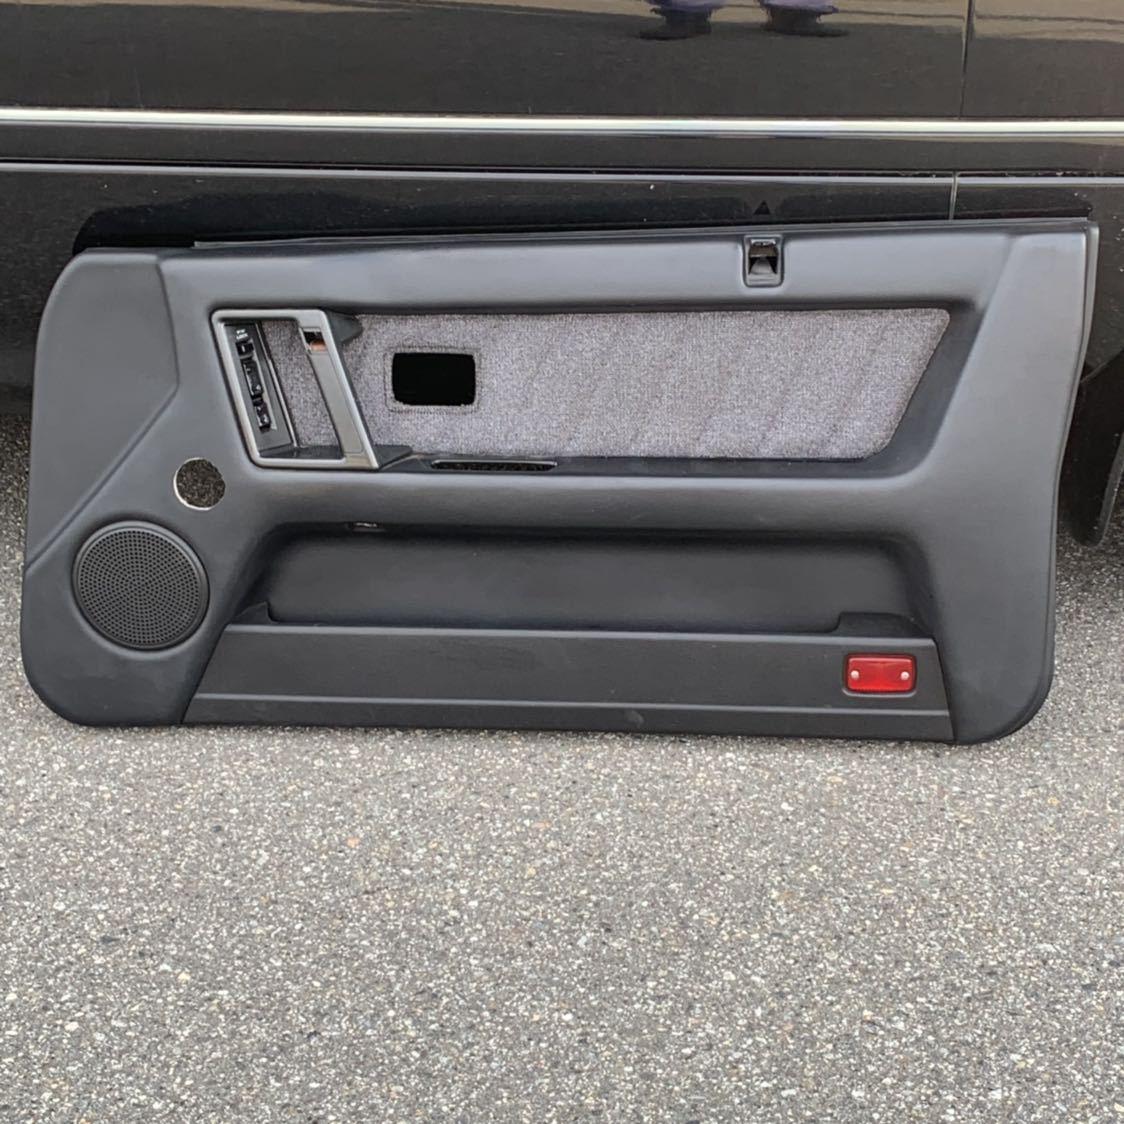 HR31 R31 スカイライン 2ドア GTS-R 右側 ドア内張り 穴あけ有り 限定車 ニスモ仕様_画像1